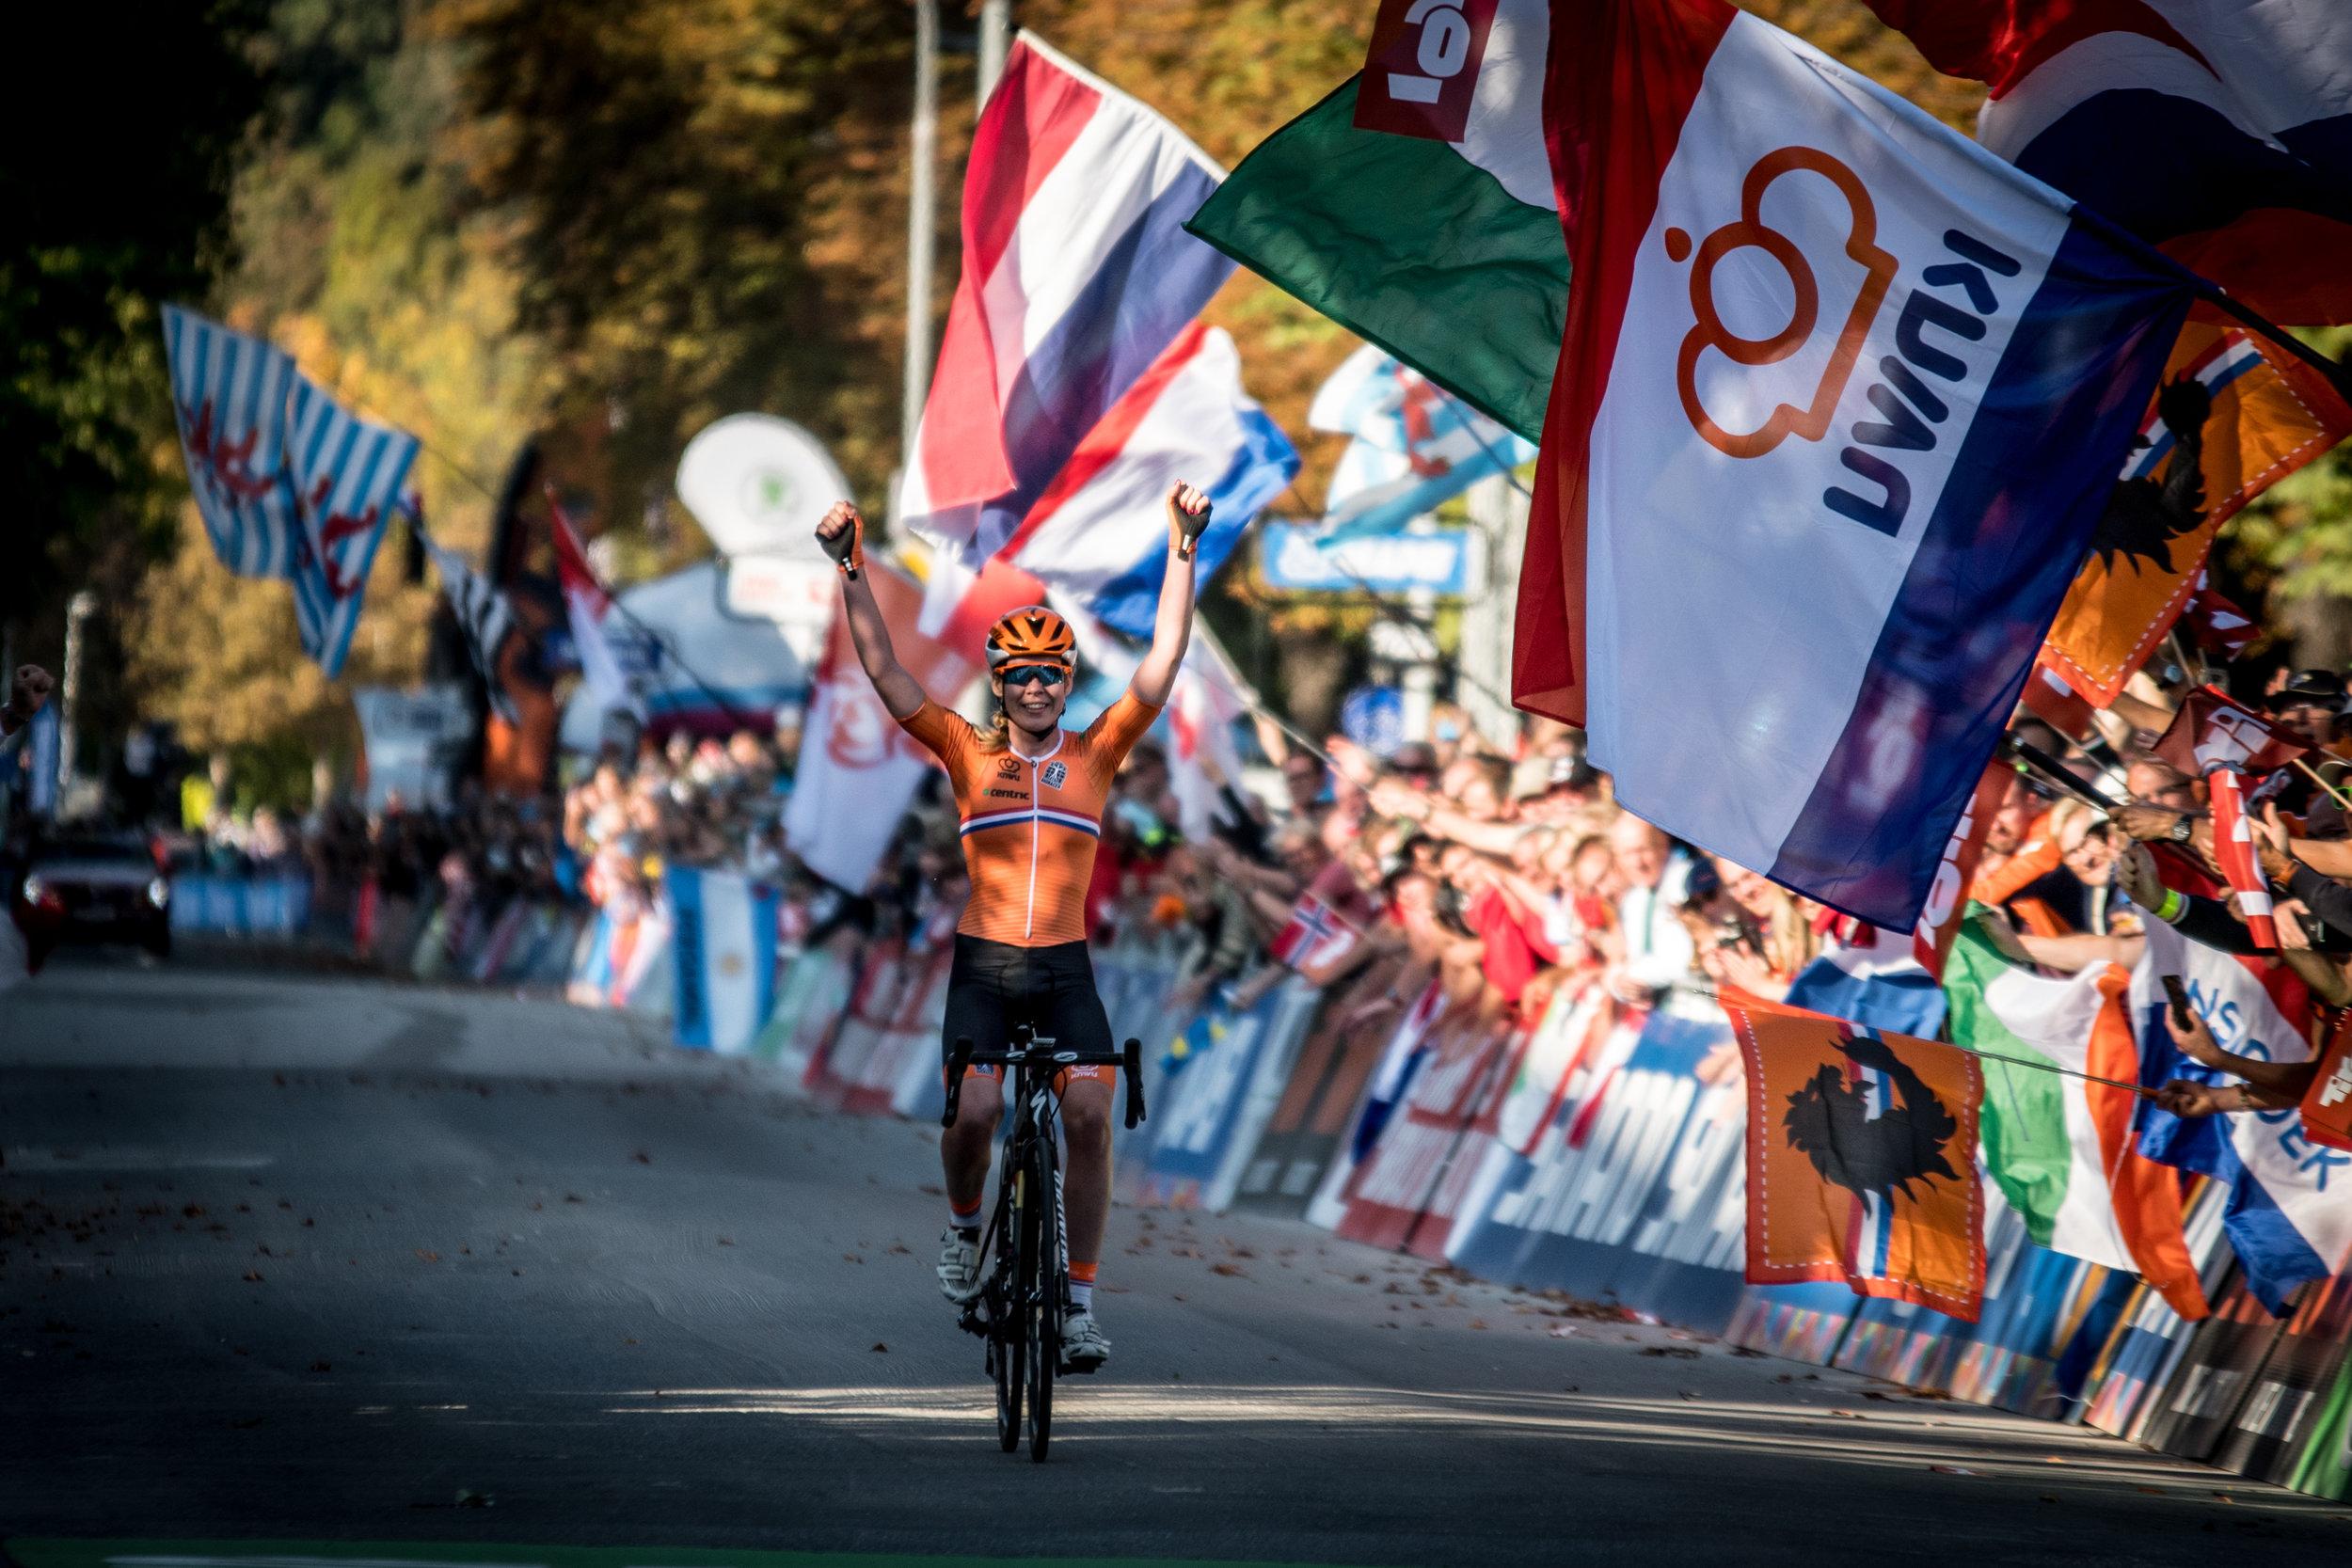 Anna van der Breggen dominated the elite women's road race, winning solo by over three minutes.